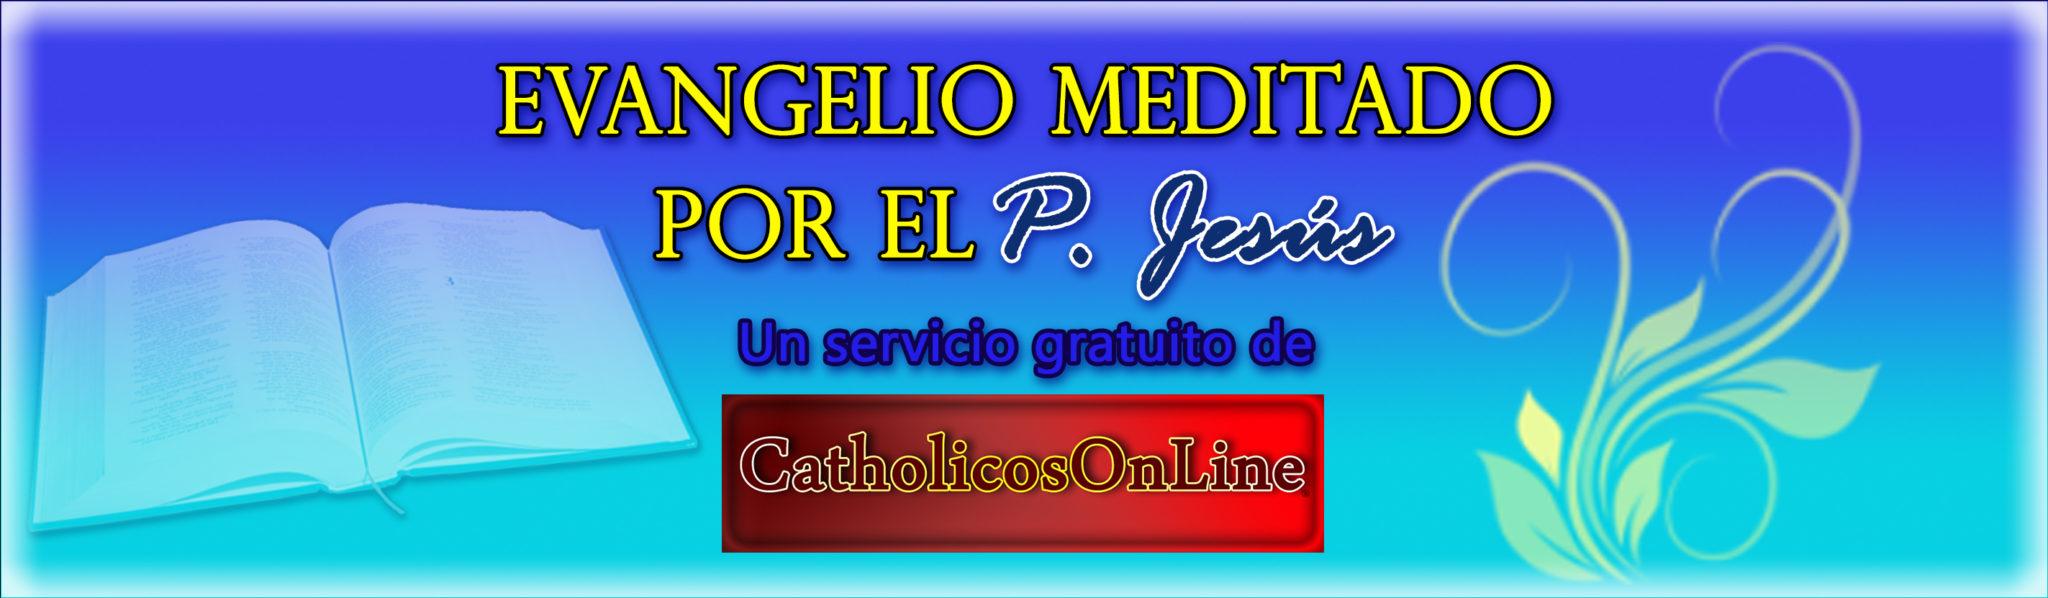 Servicio gratuito de CatholicosOnLine